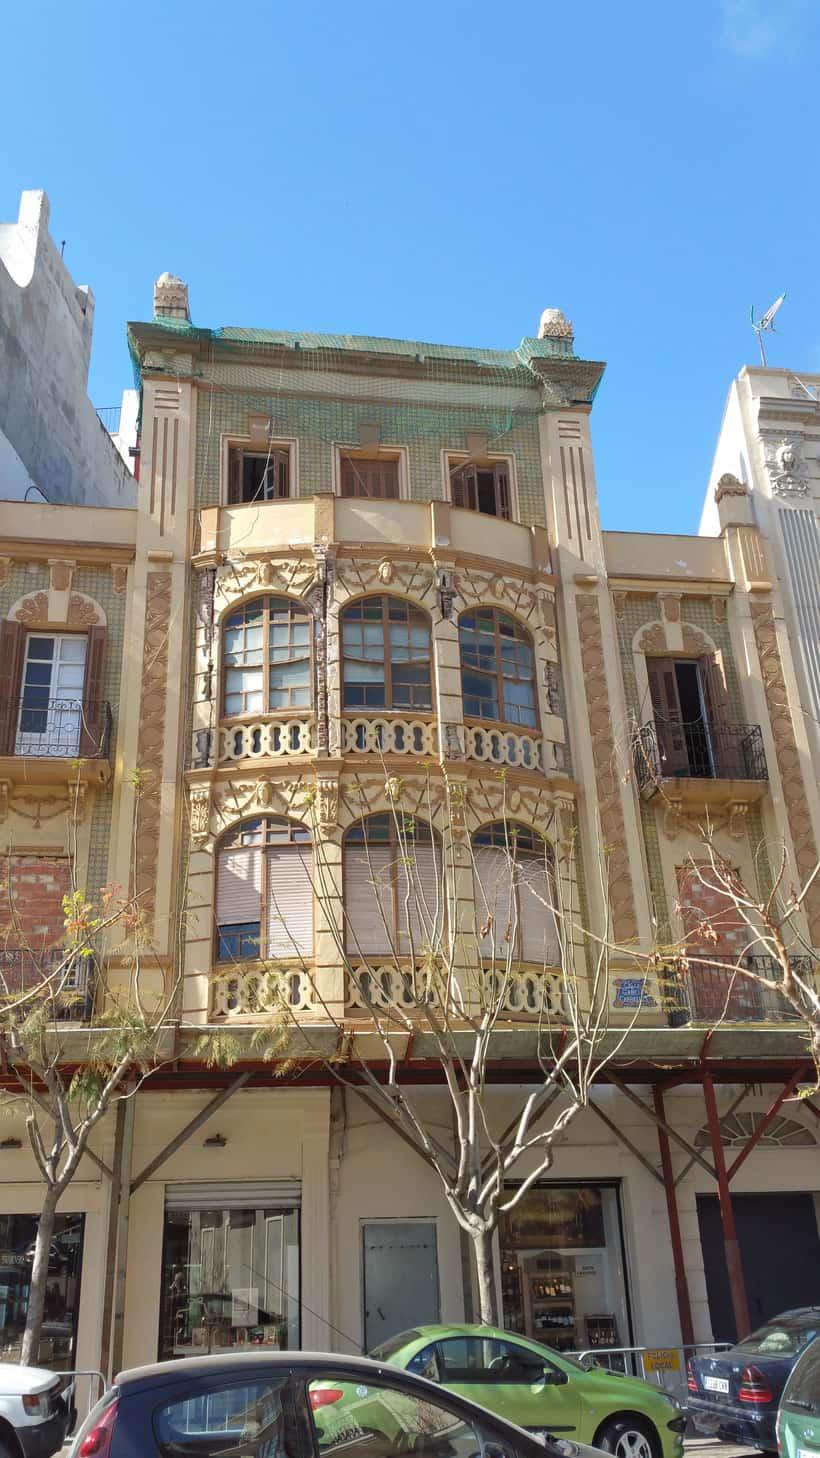 carmona, seville, sevilla, excursion, parador, viajar, travel, eat, comer, andalucia, white village, moorish, hotel